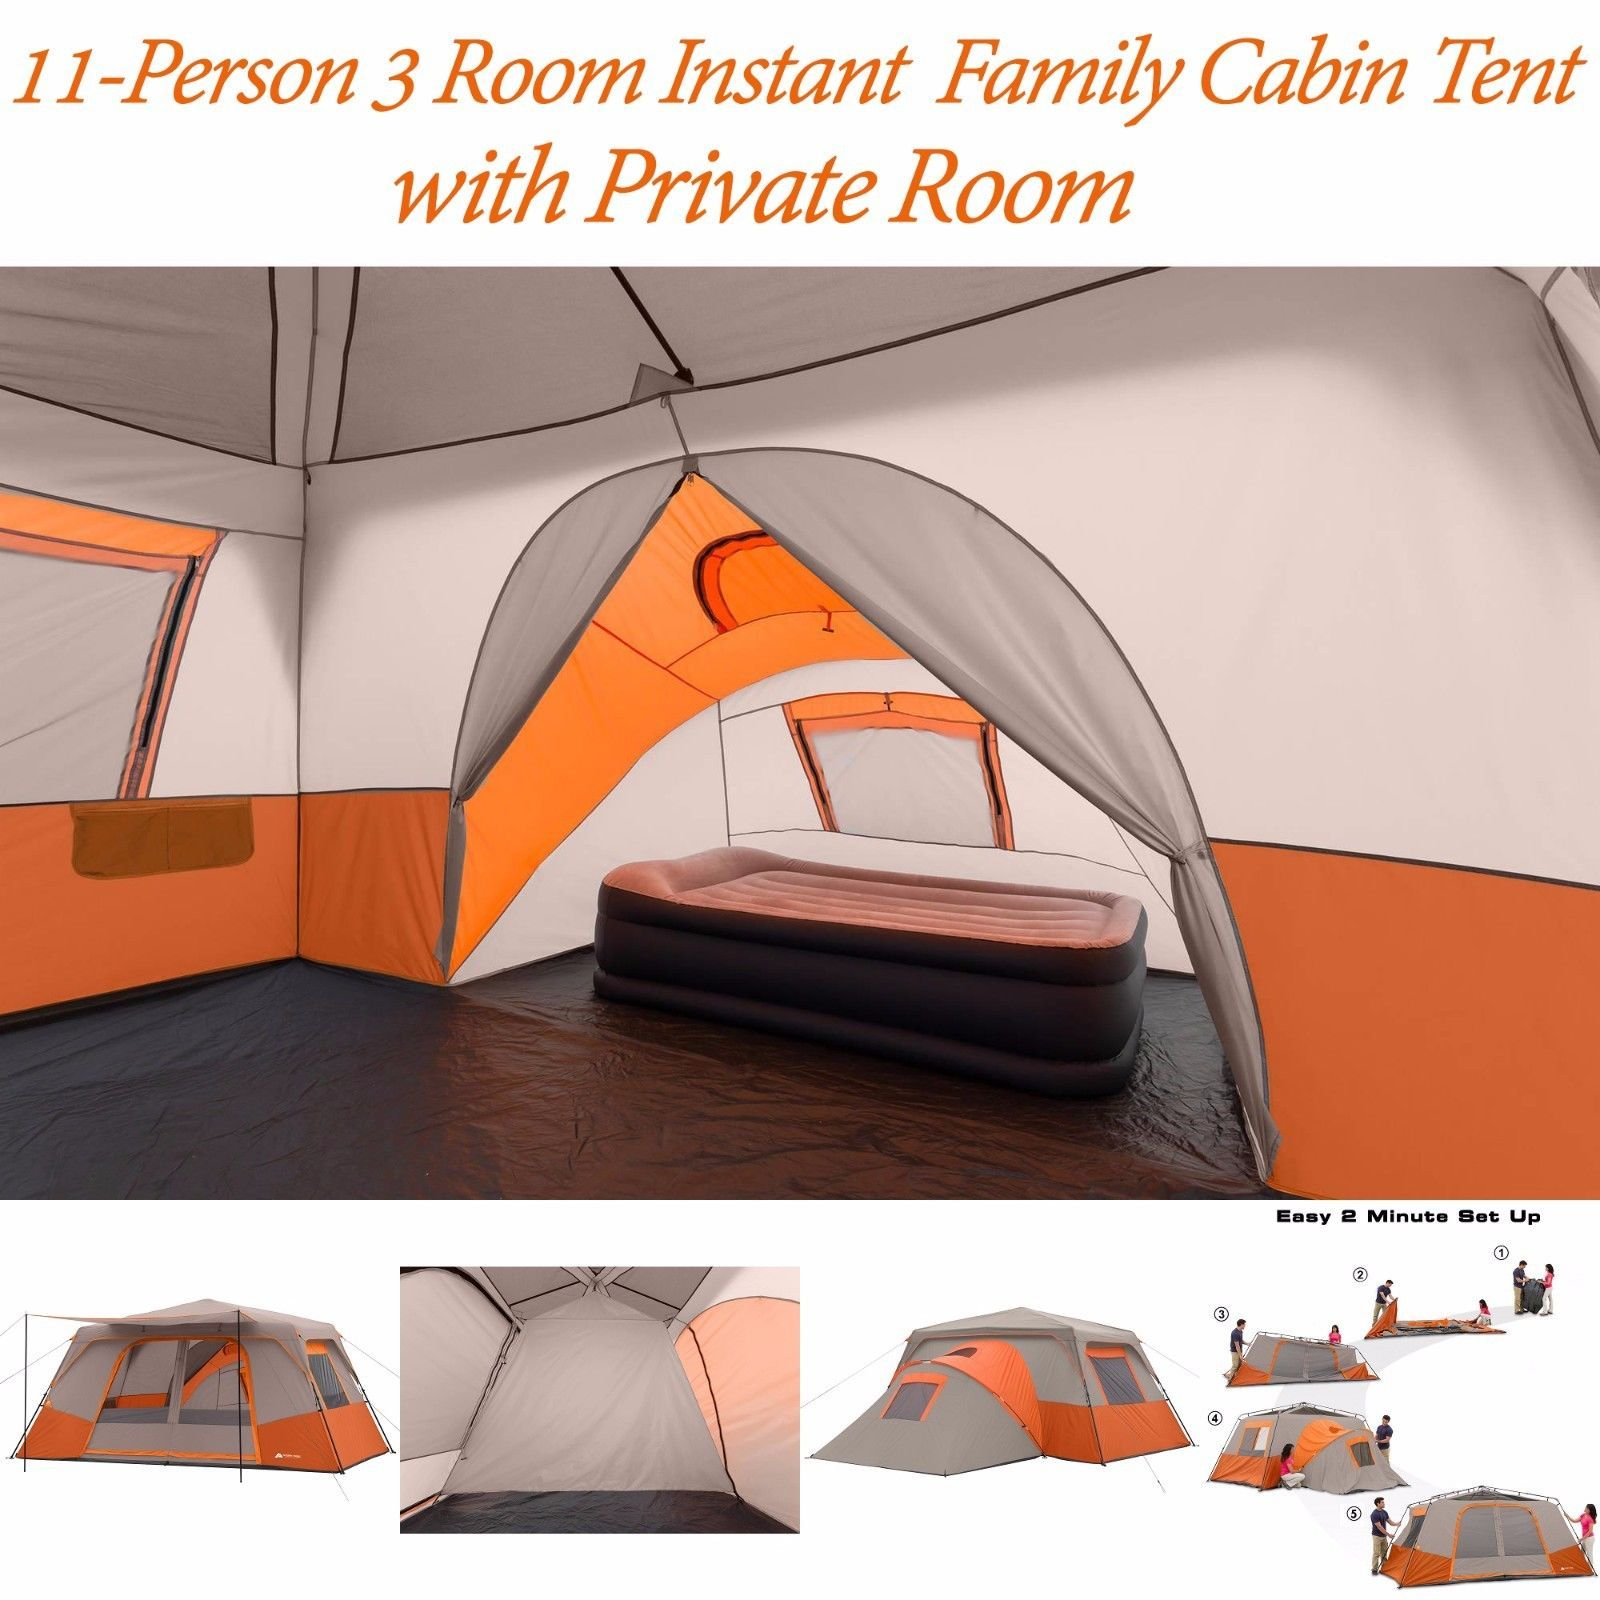 Buy Ozark Trail 3 Room Instant Cabin Tent Privacy Set up 2 Min. at online store  sc 1 st  Pinterest & Ozark Trail 15 Person Instant Cabin Large Tent Camping Split Plan ...